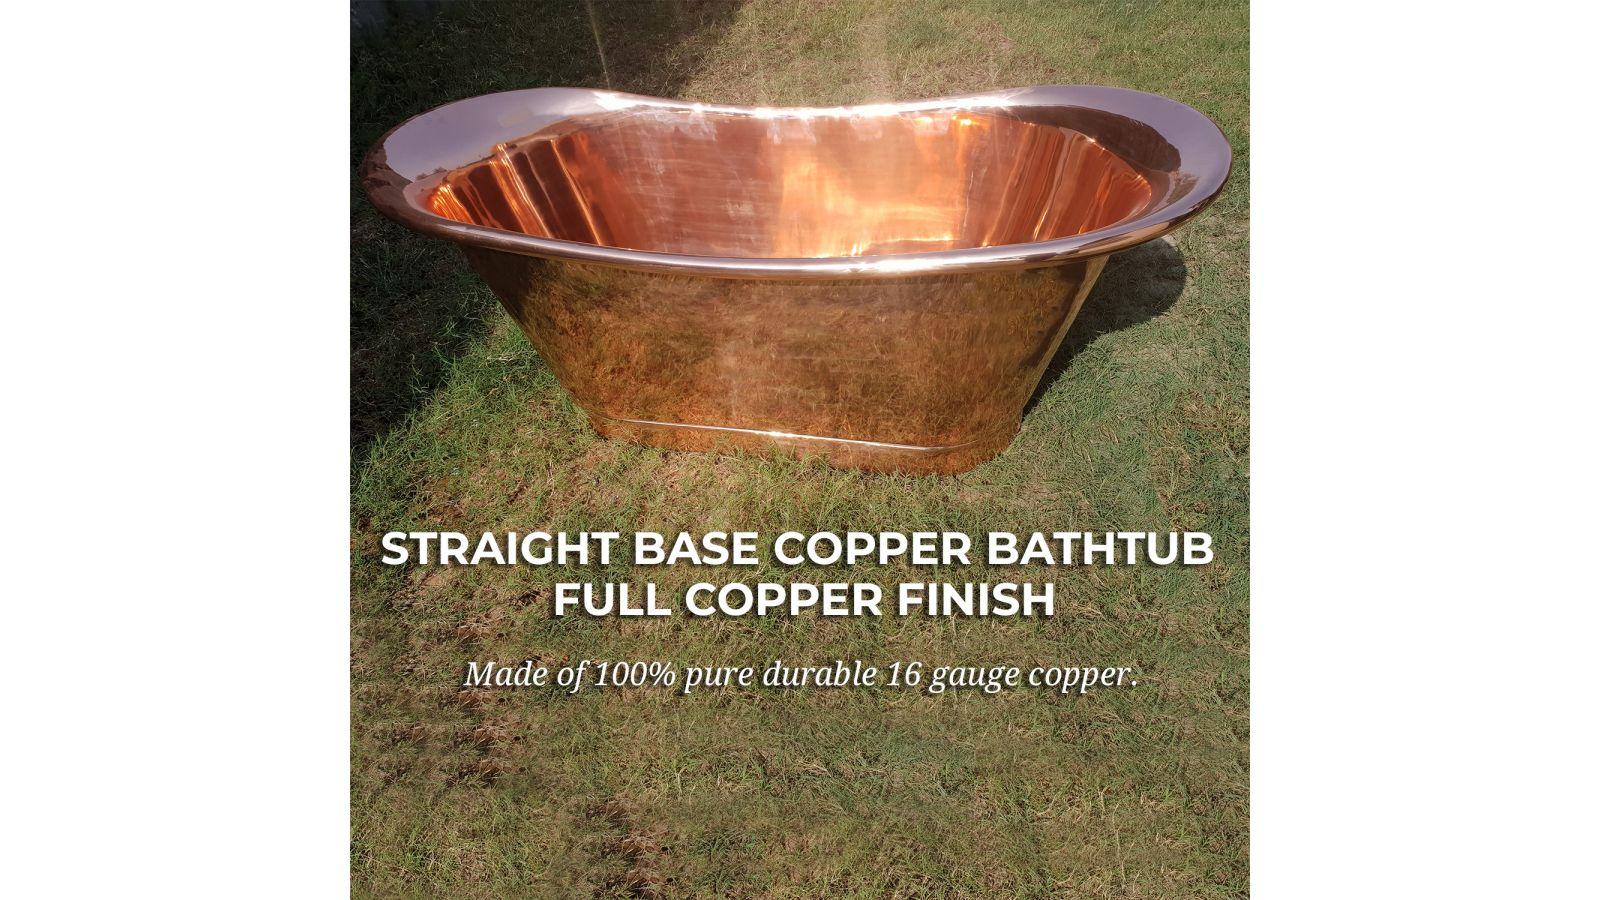 Straight Base Copper Bathtub Full Copper Finish